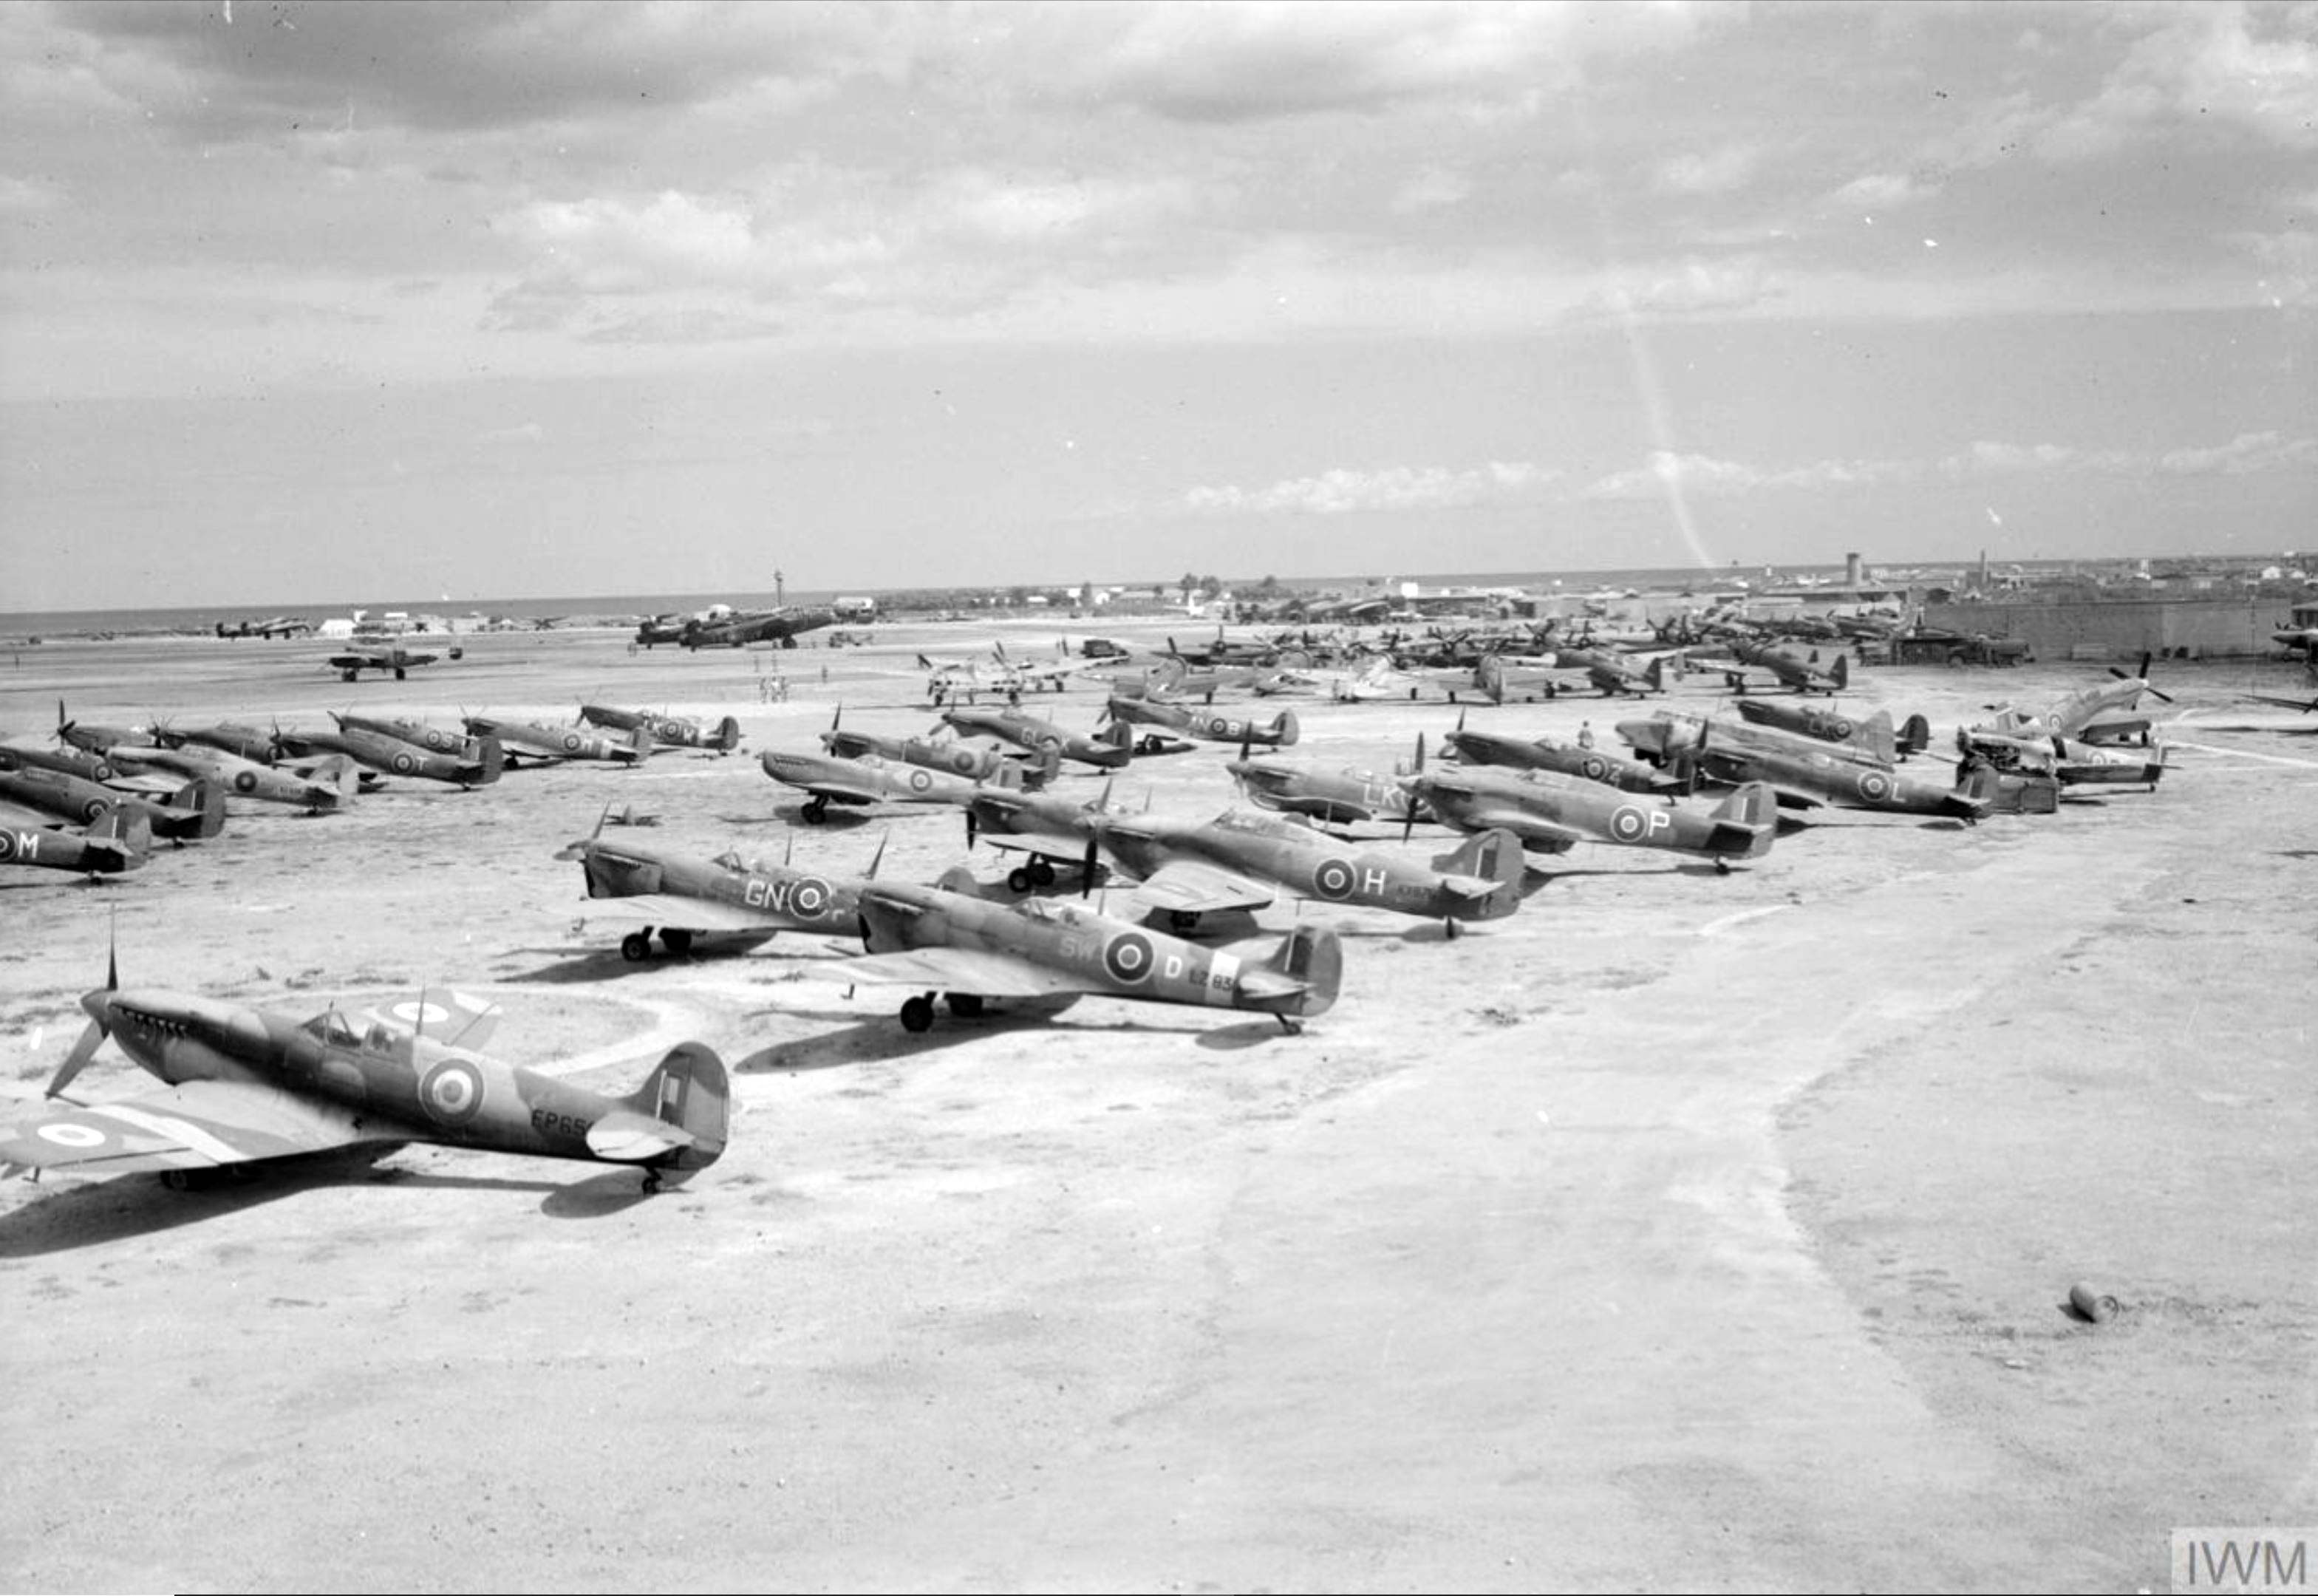 Spitfires at RAF 110 Maintenance Unit Brindisi Italy 1943 IWM CNA3285